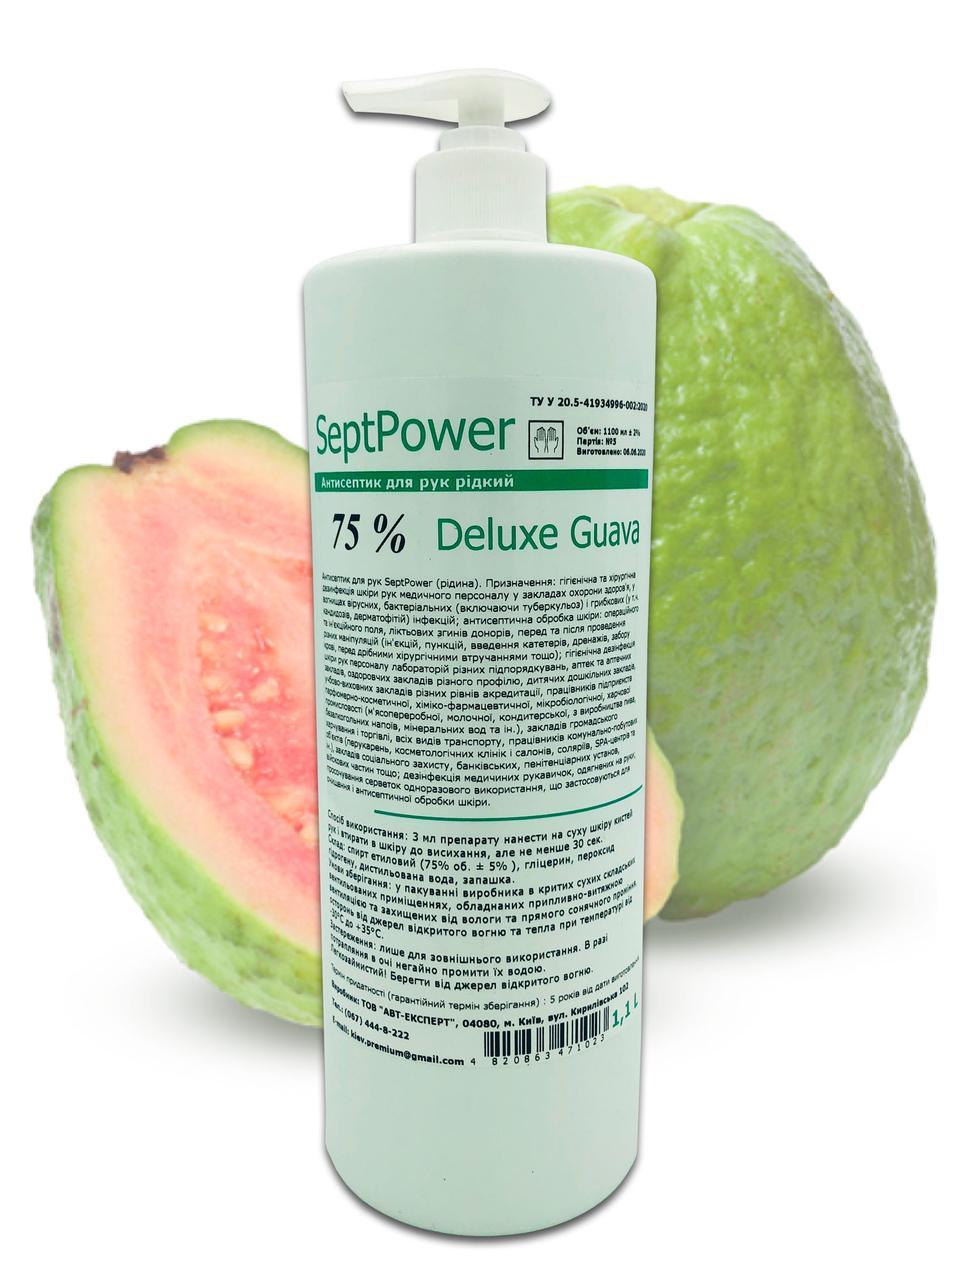 Антисептик спиртовой для рук 75% спирта SeptPower Deluxe Guava 1.1 l